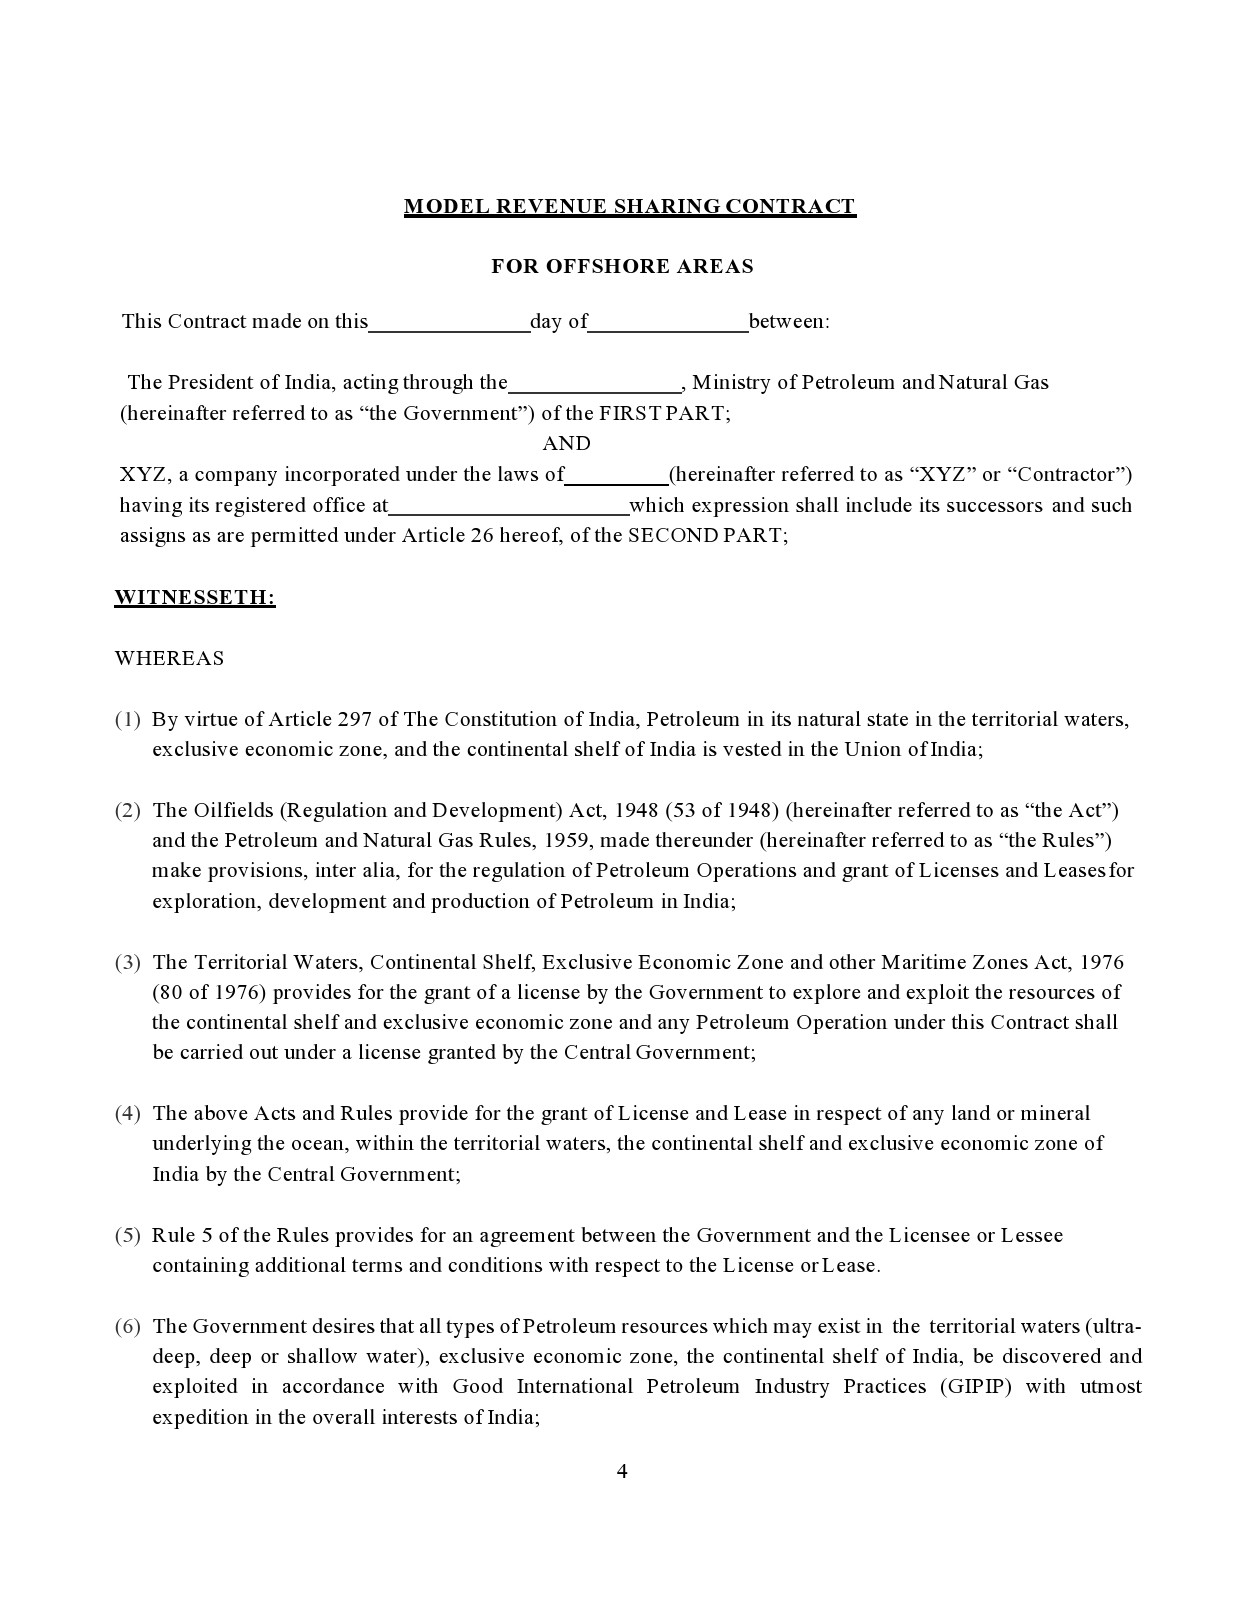 Free profit sharing agreement 35